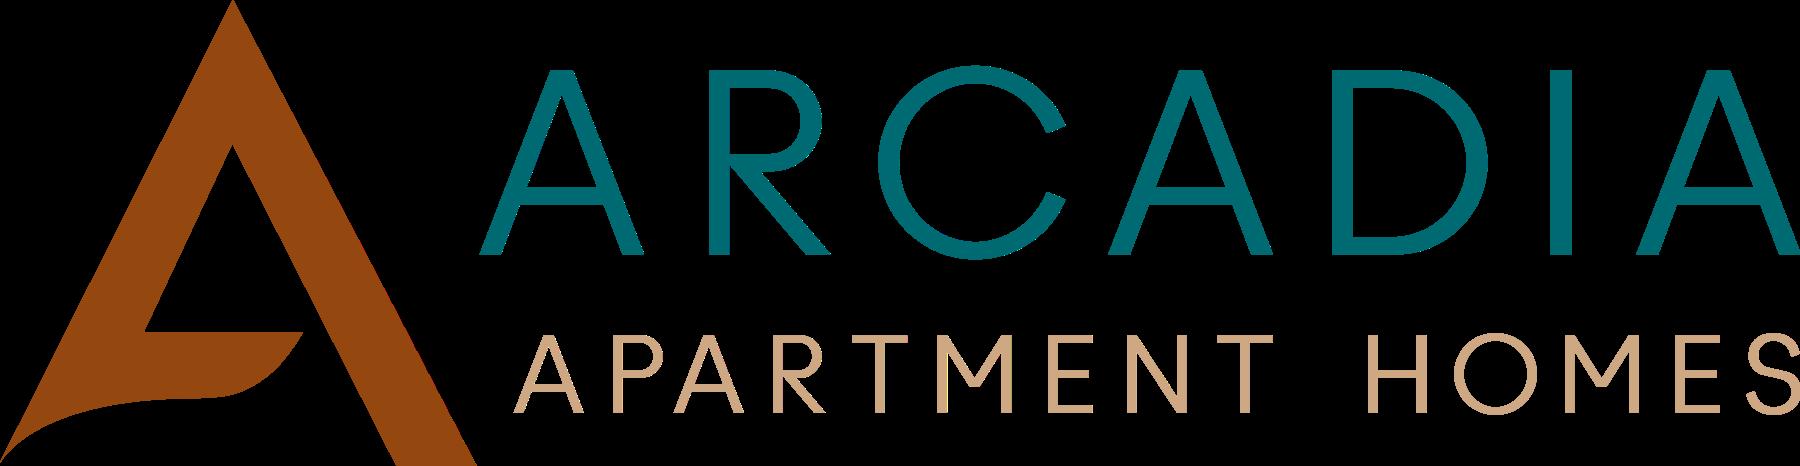 Arcadia Apartment Homes Logo